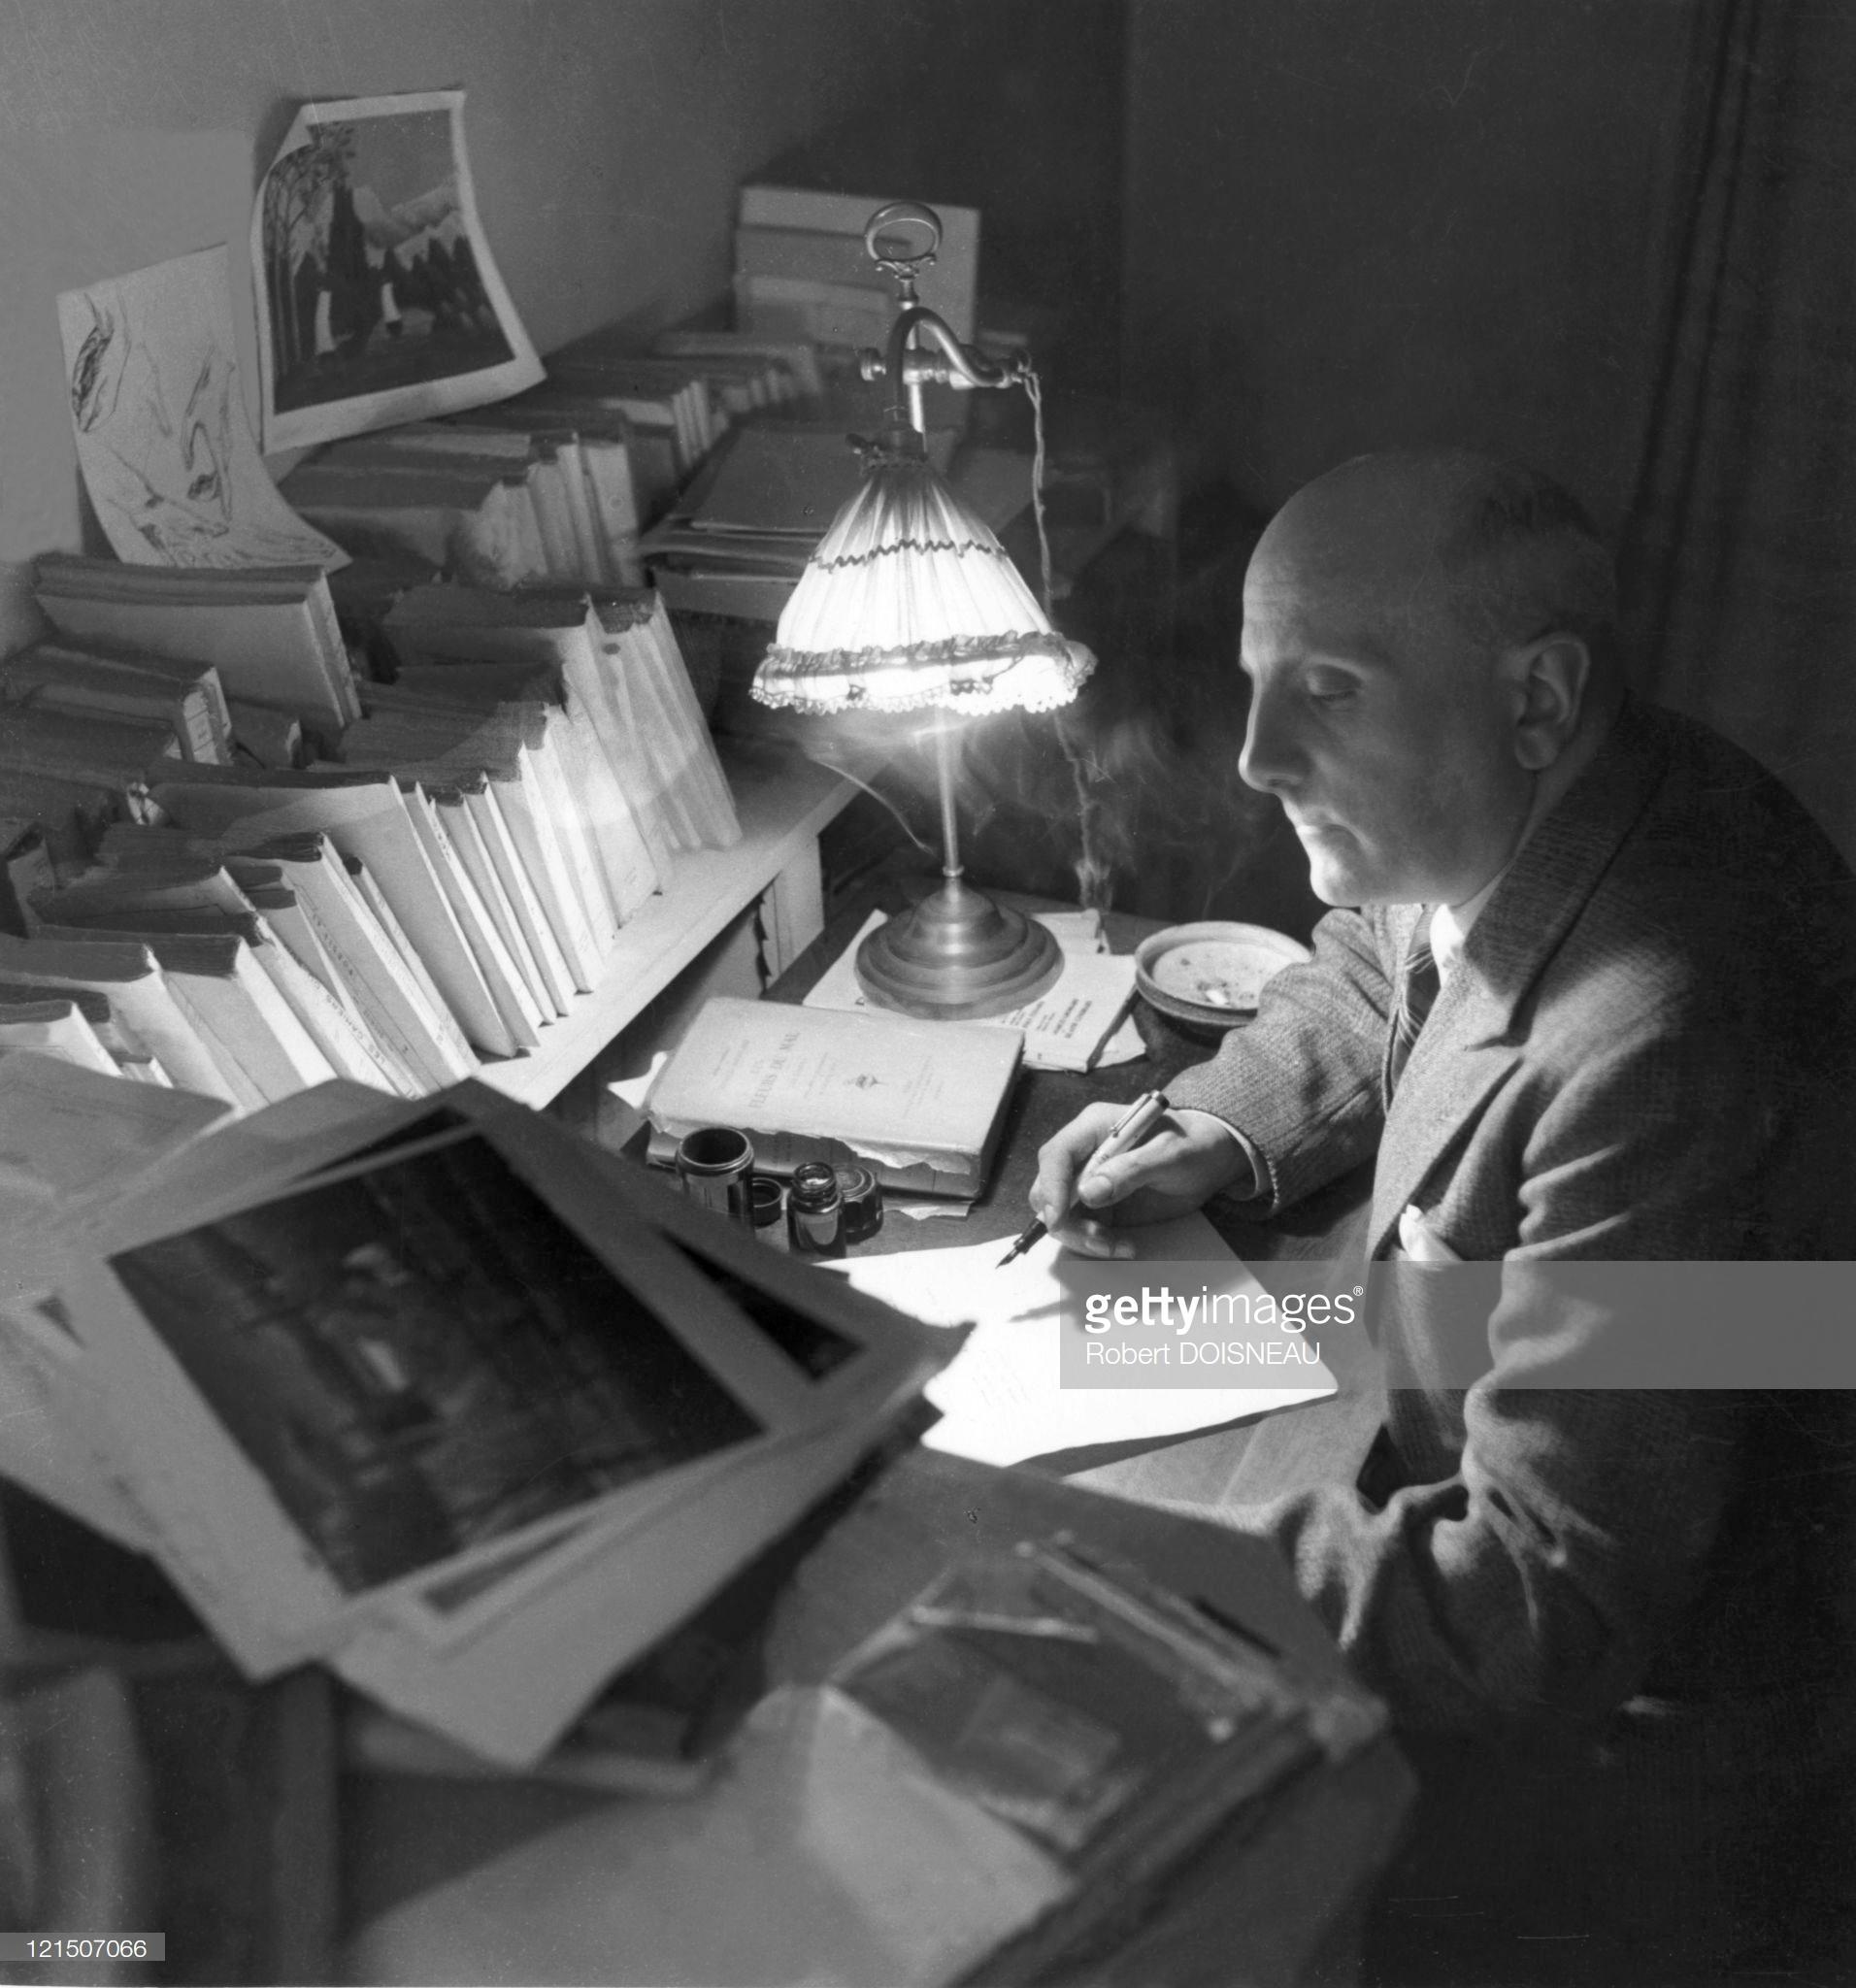 1944. Жан Тардьё — французский поэт, драматург, эссеист, переводчик. Один из зачинателей театра абсурда.